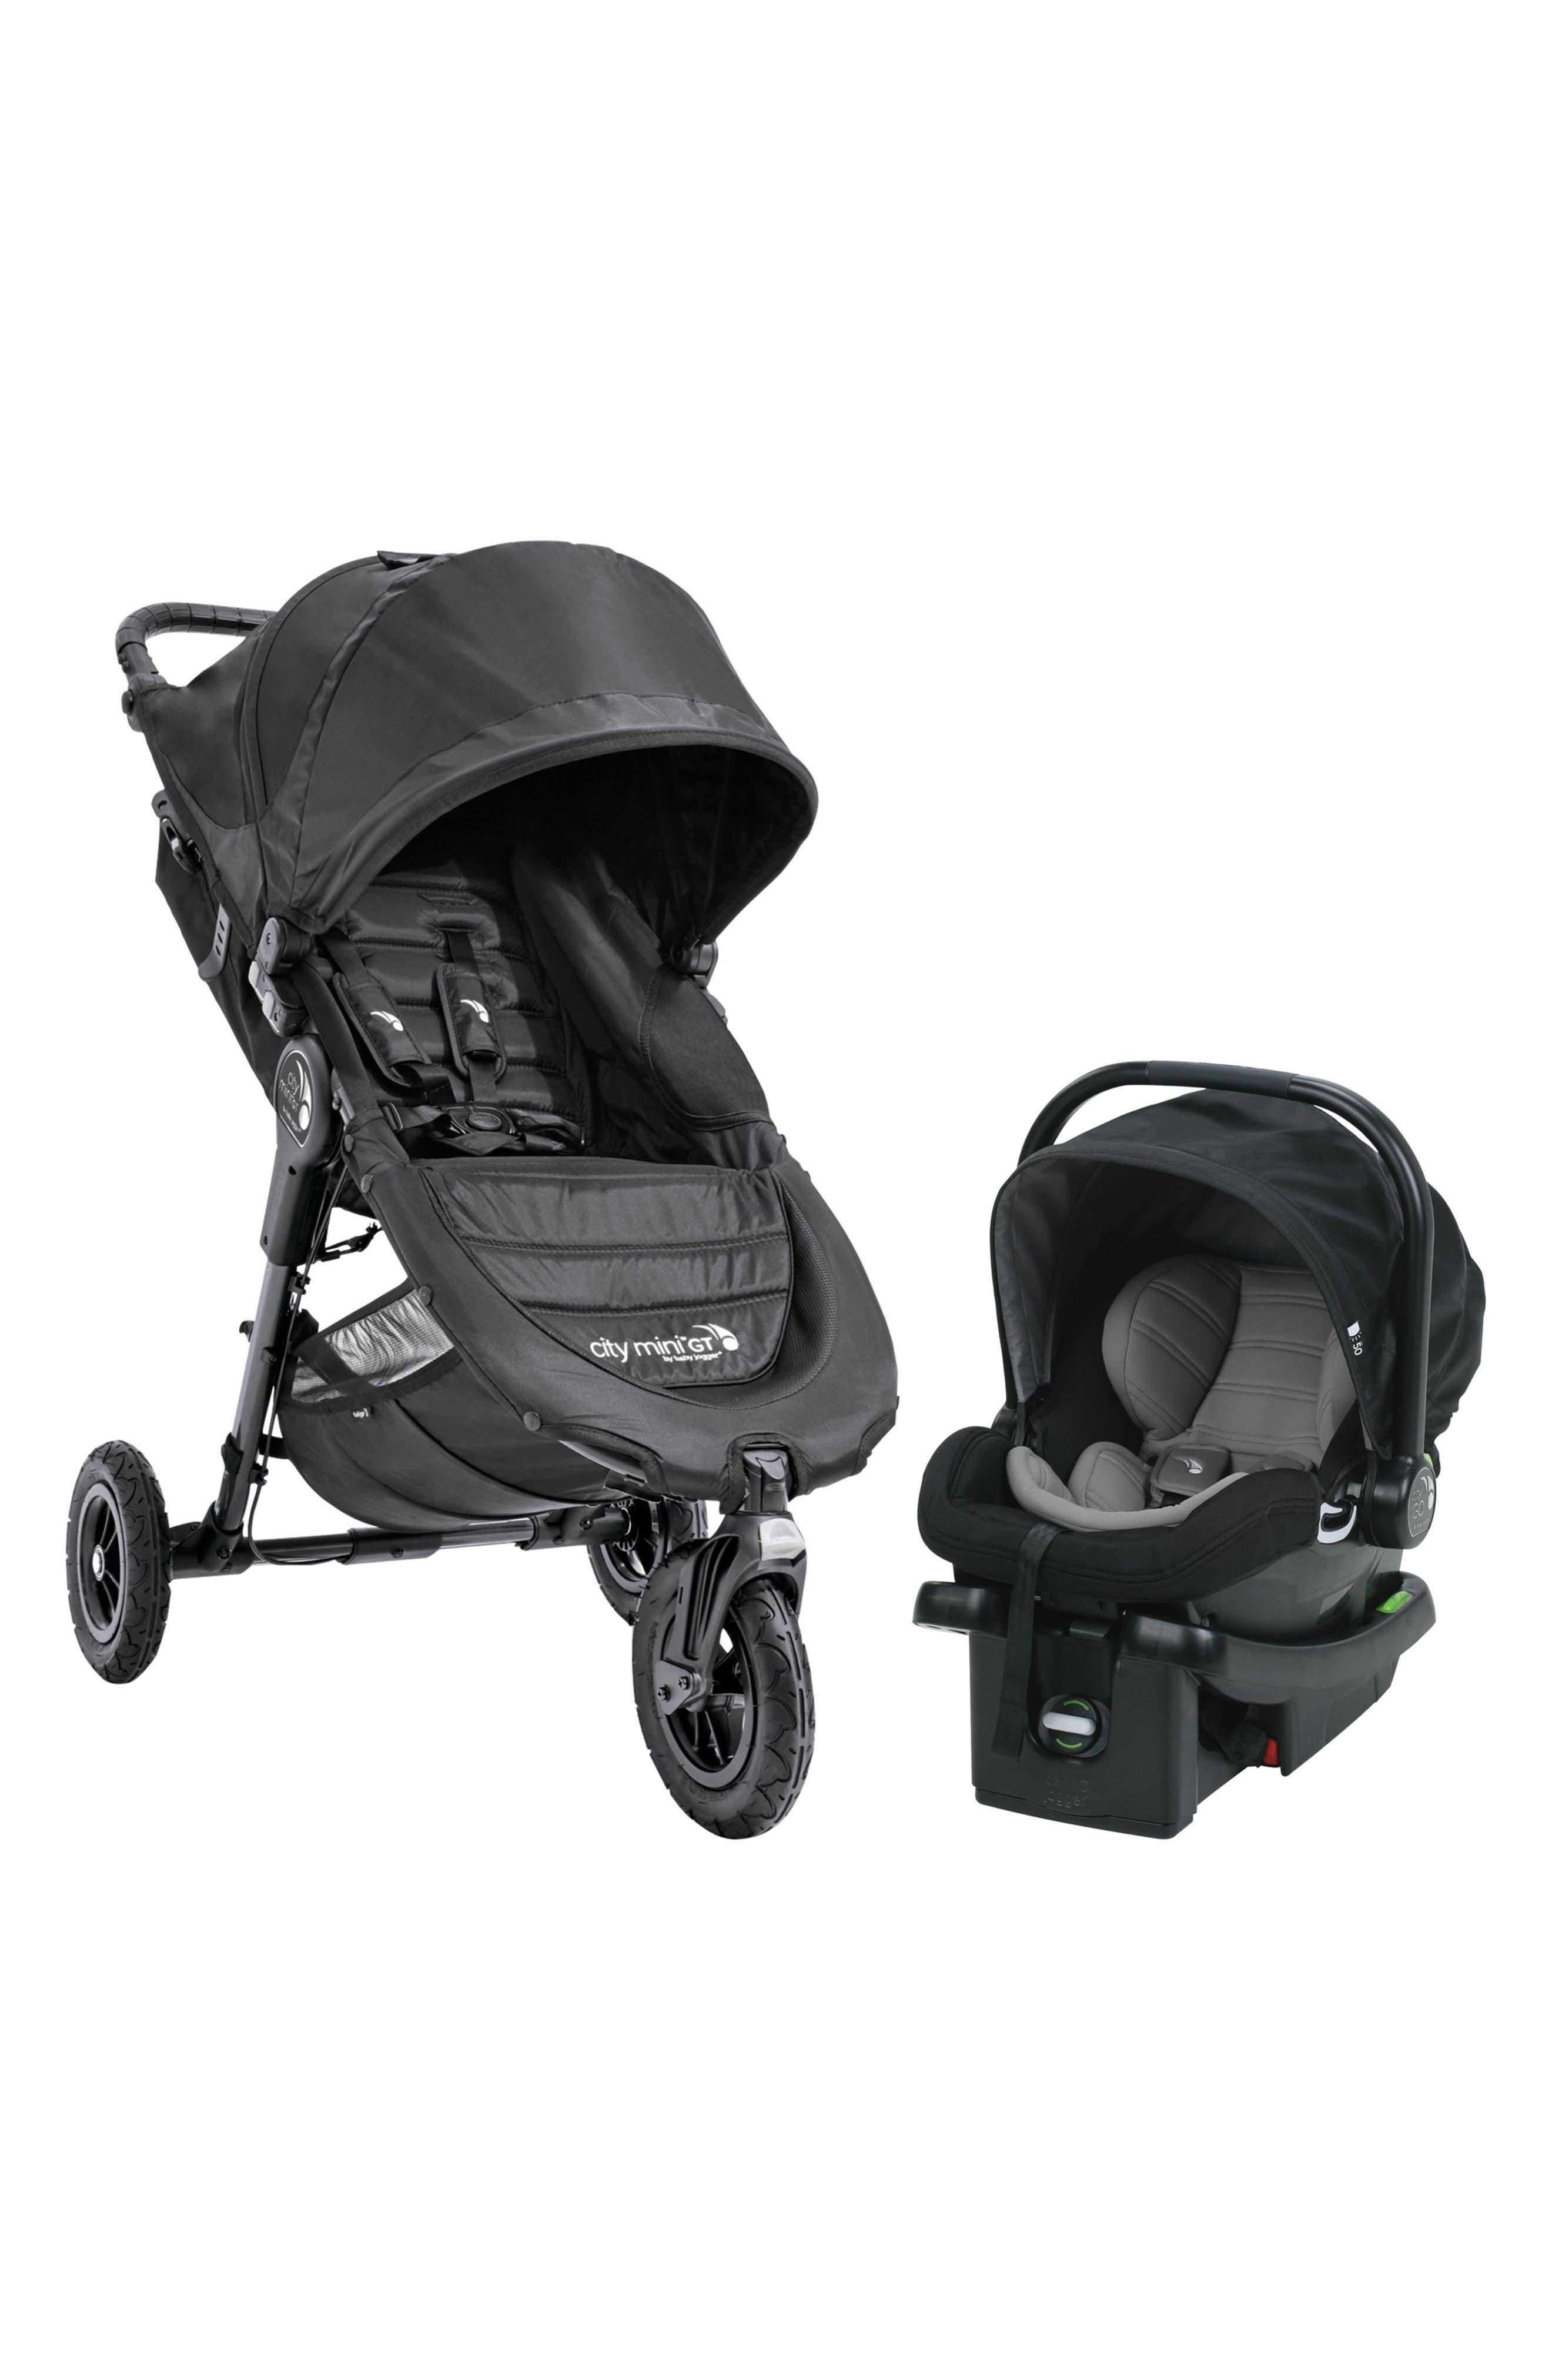 Baby Jogger City Mini® Stroller & City Go® Infant Car Seat Travel System